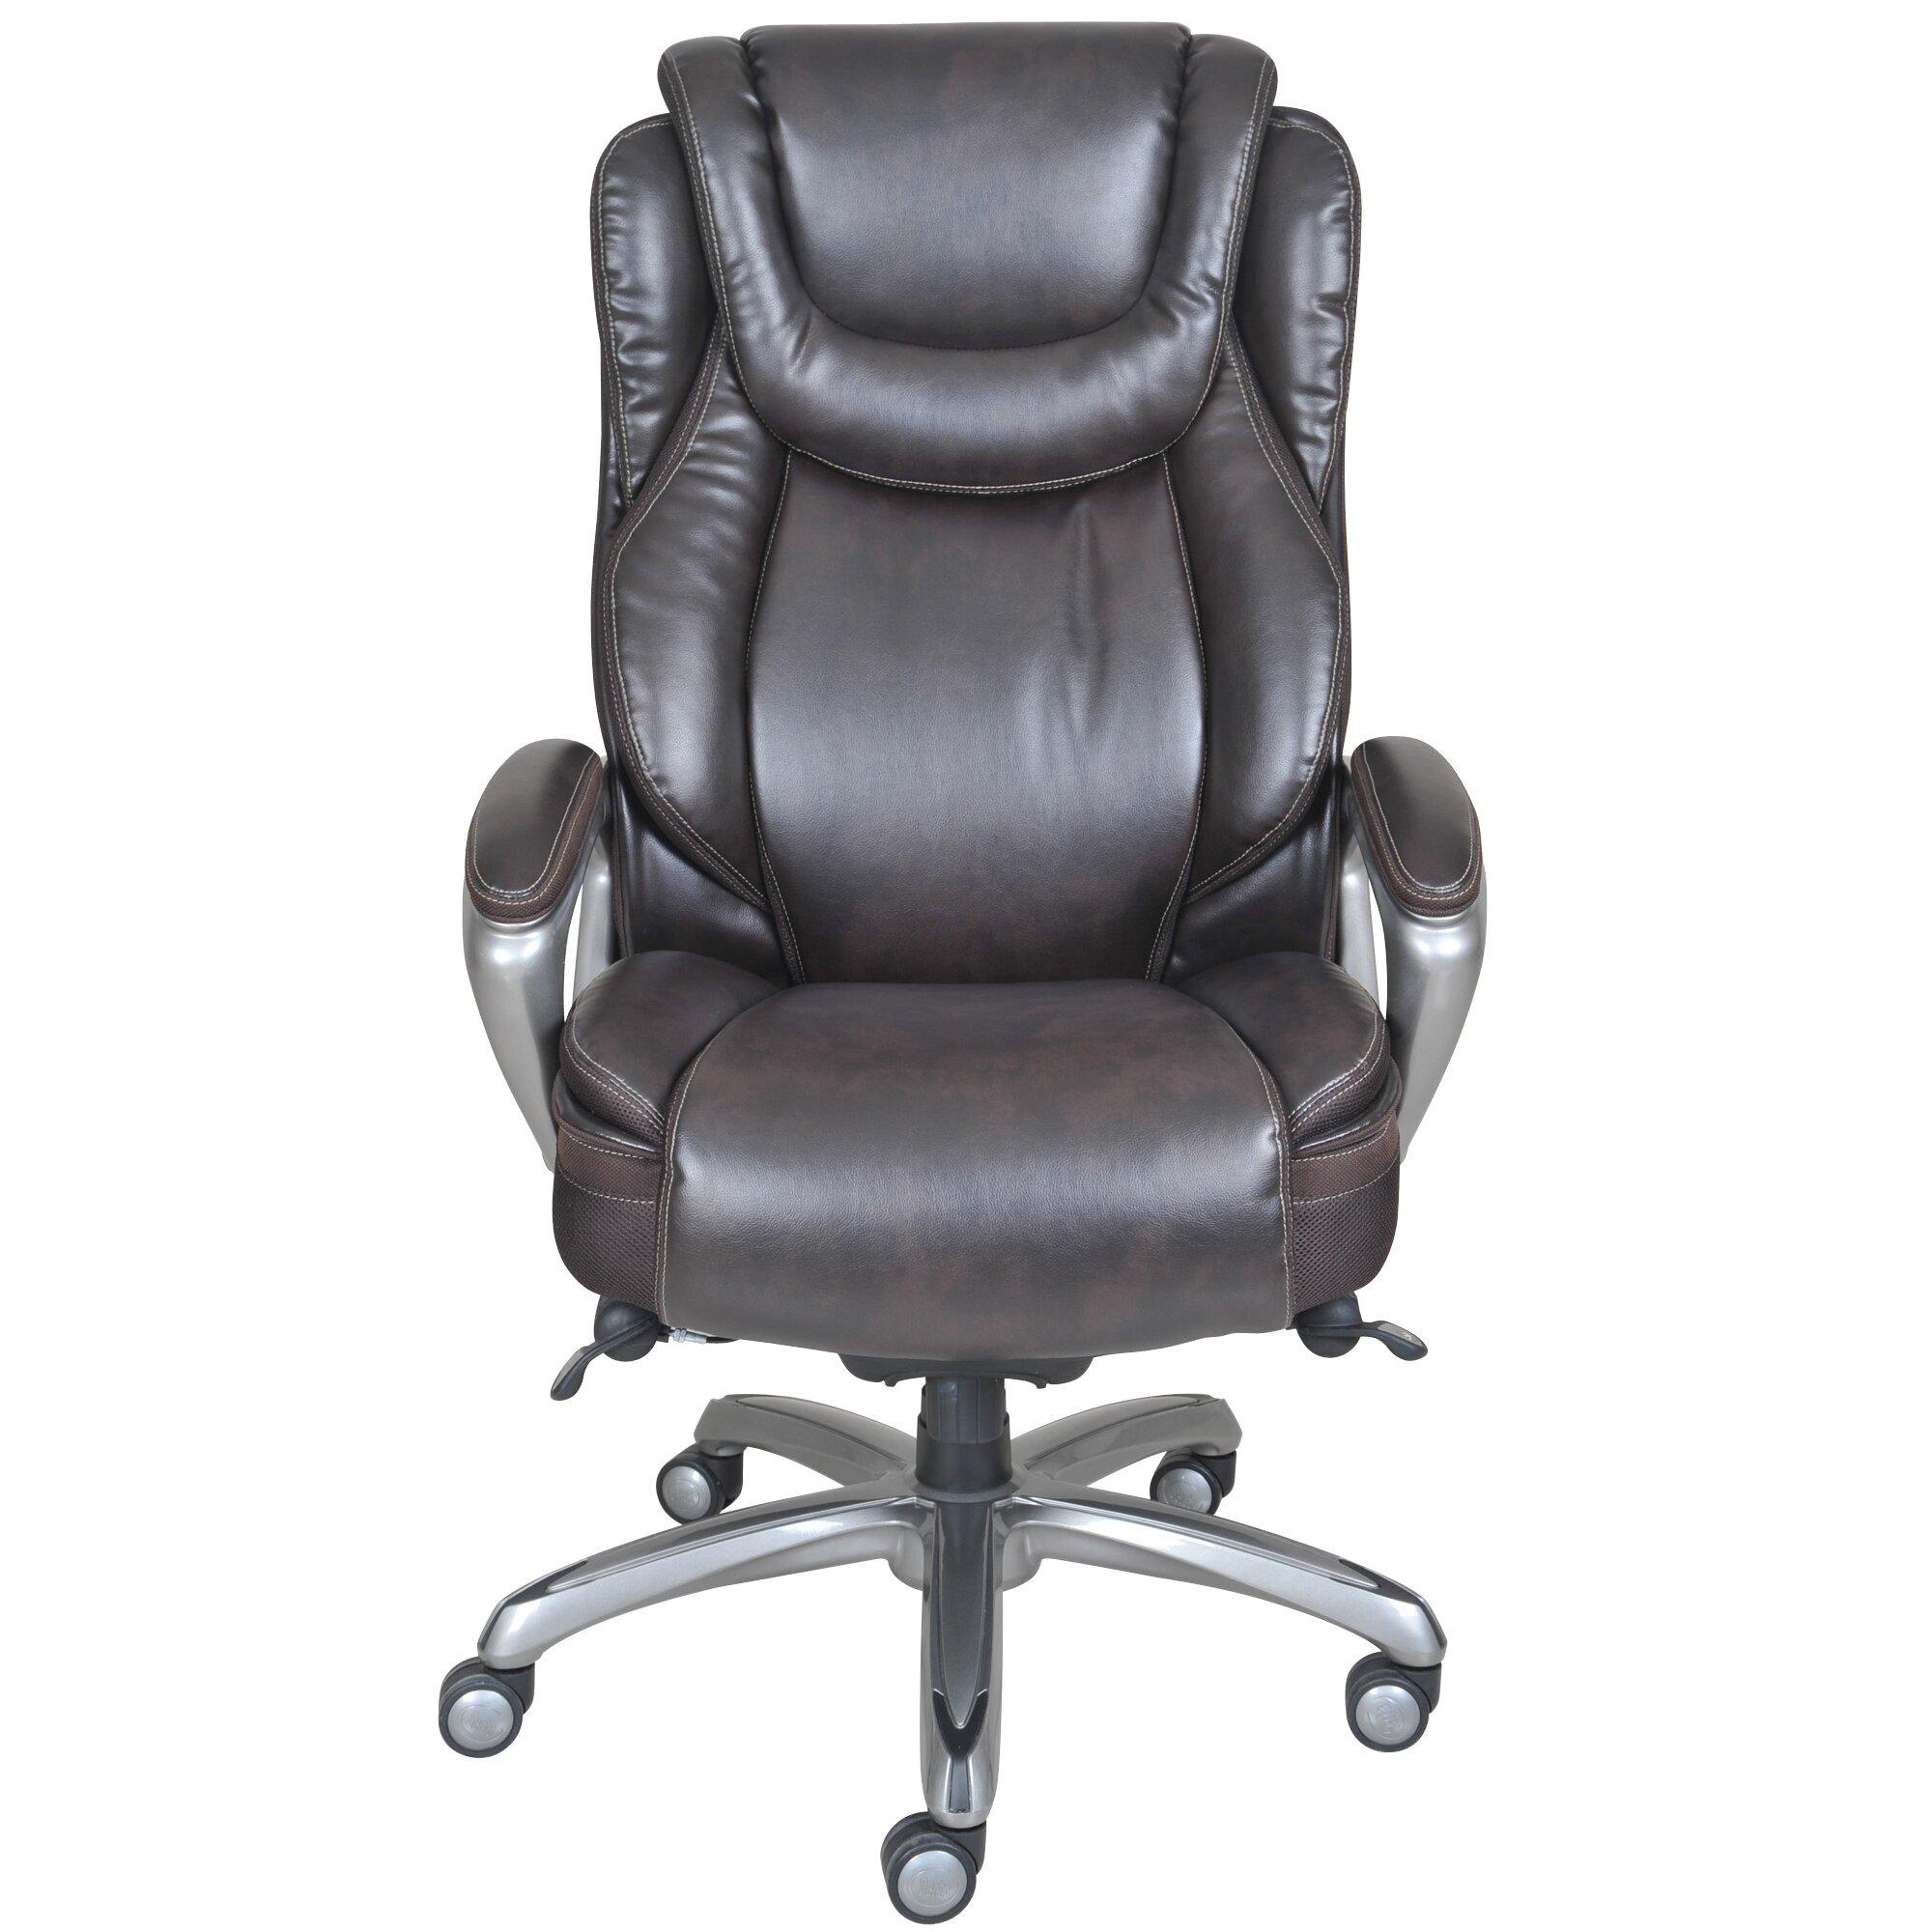 Serta At Home Harmony High Back Executive Chair Reviews Wayfair